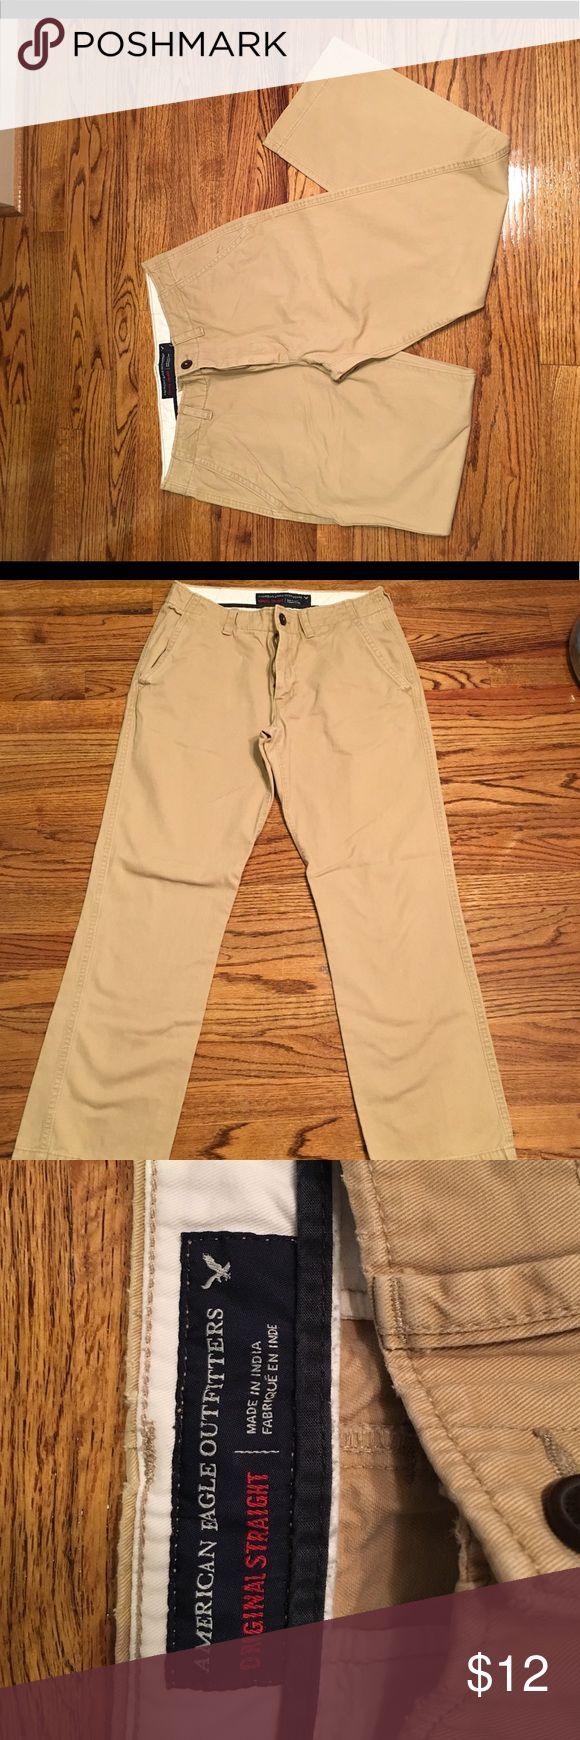 AE Mens Khaki Pants AE Original straight Mens khaki pants. Size 32/32. Good condition American Eagle Outfitters Pants Chinos & Khakis